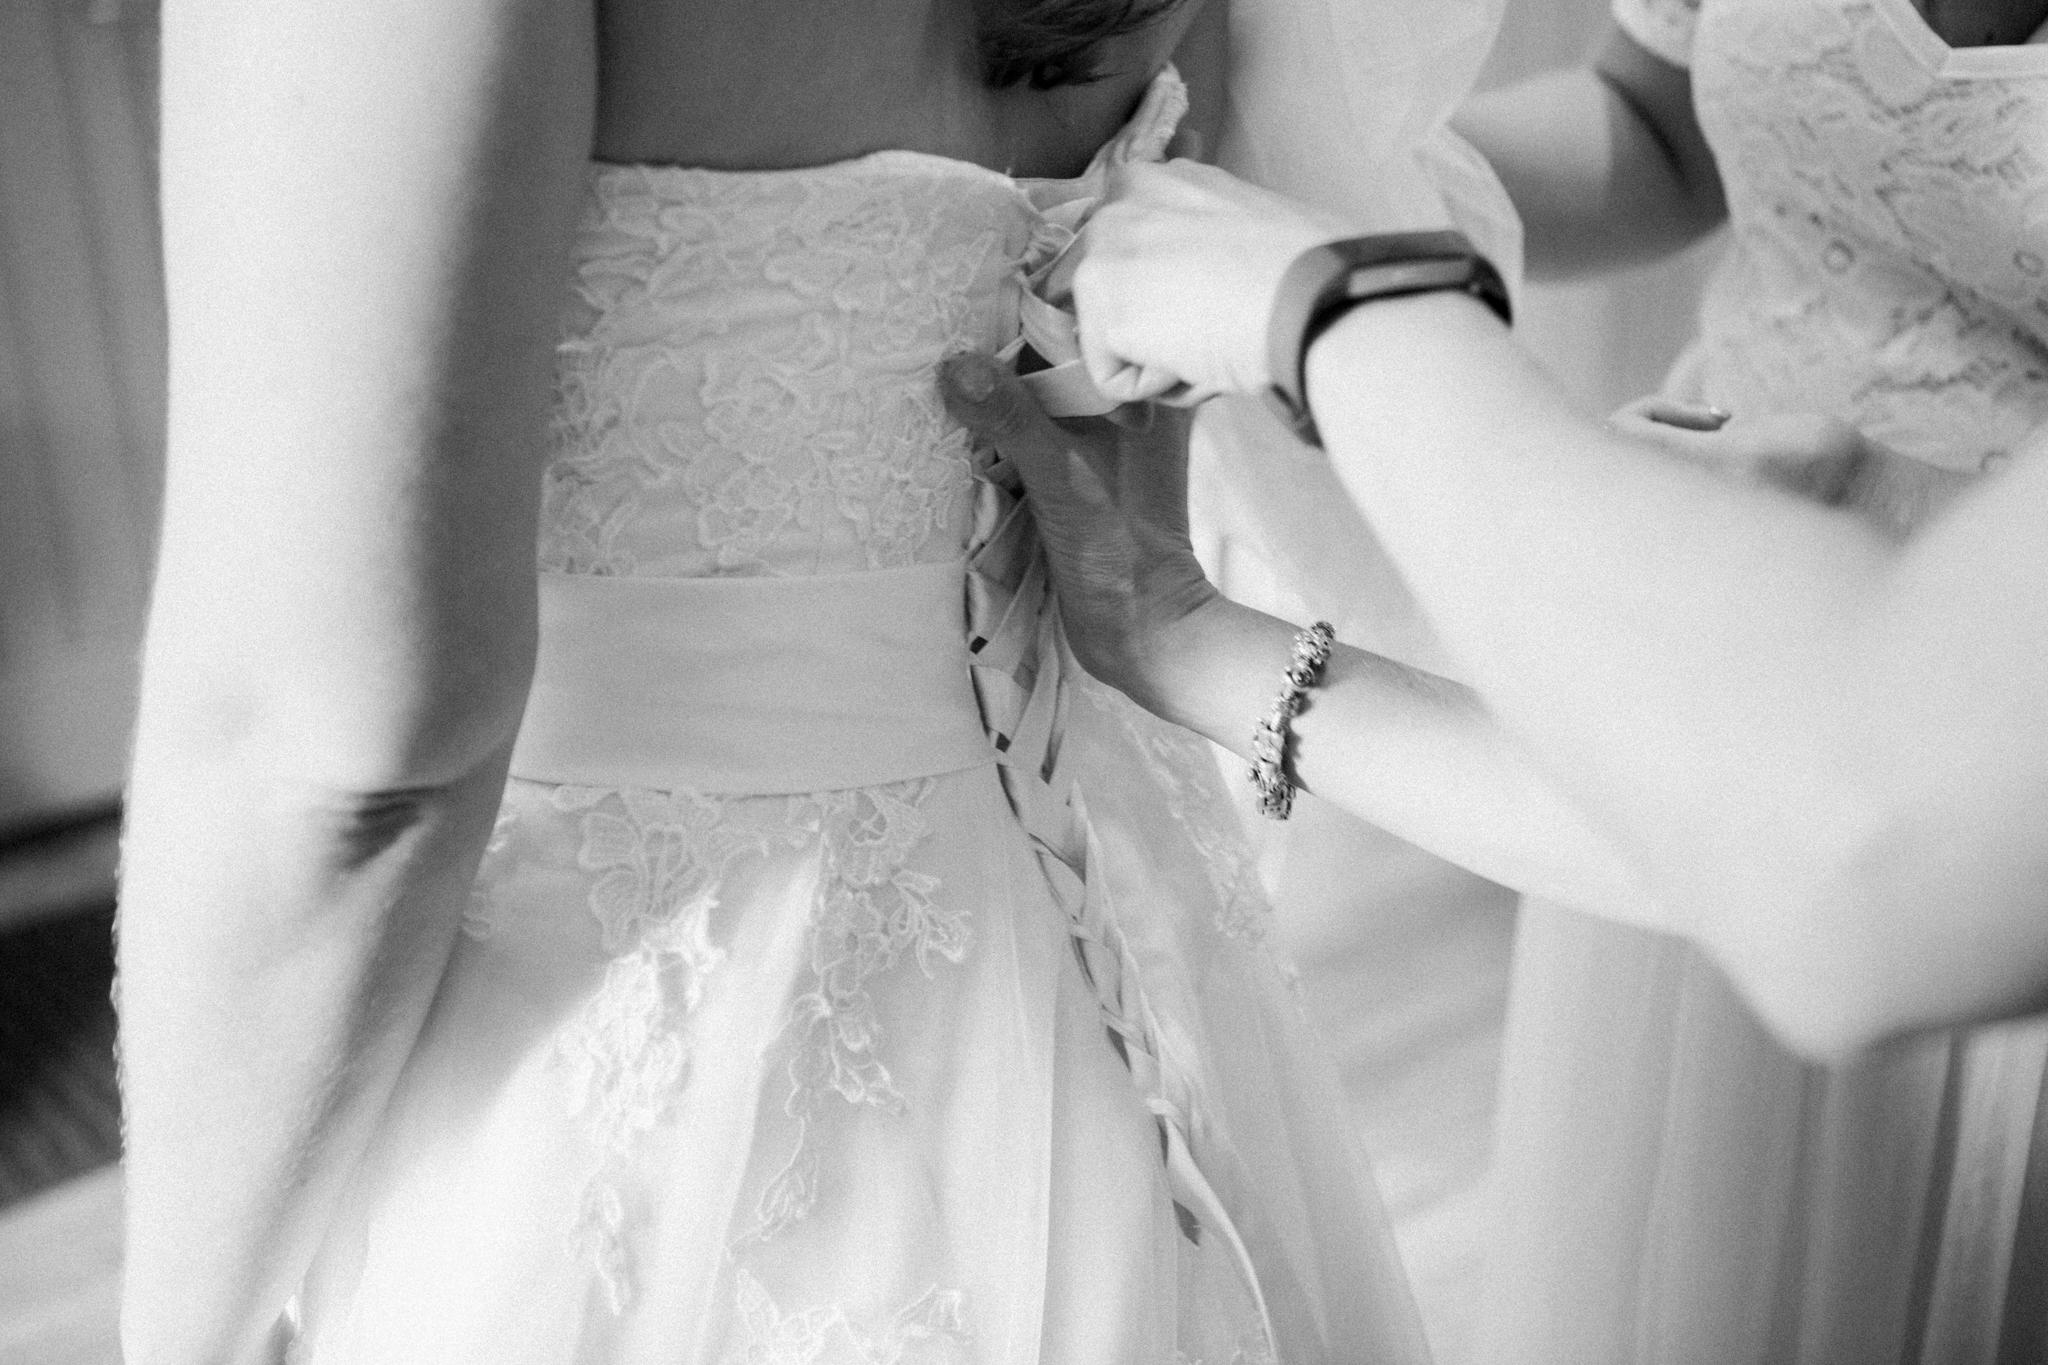 Rowsie & Lee, Swallows Nest Barn Wedding, Cotswold wedding photographer, Warwickshire Wedding Photographer-37.jpg